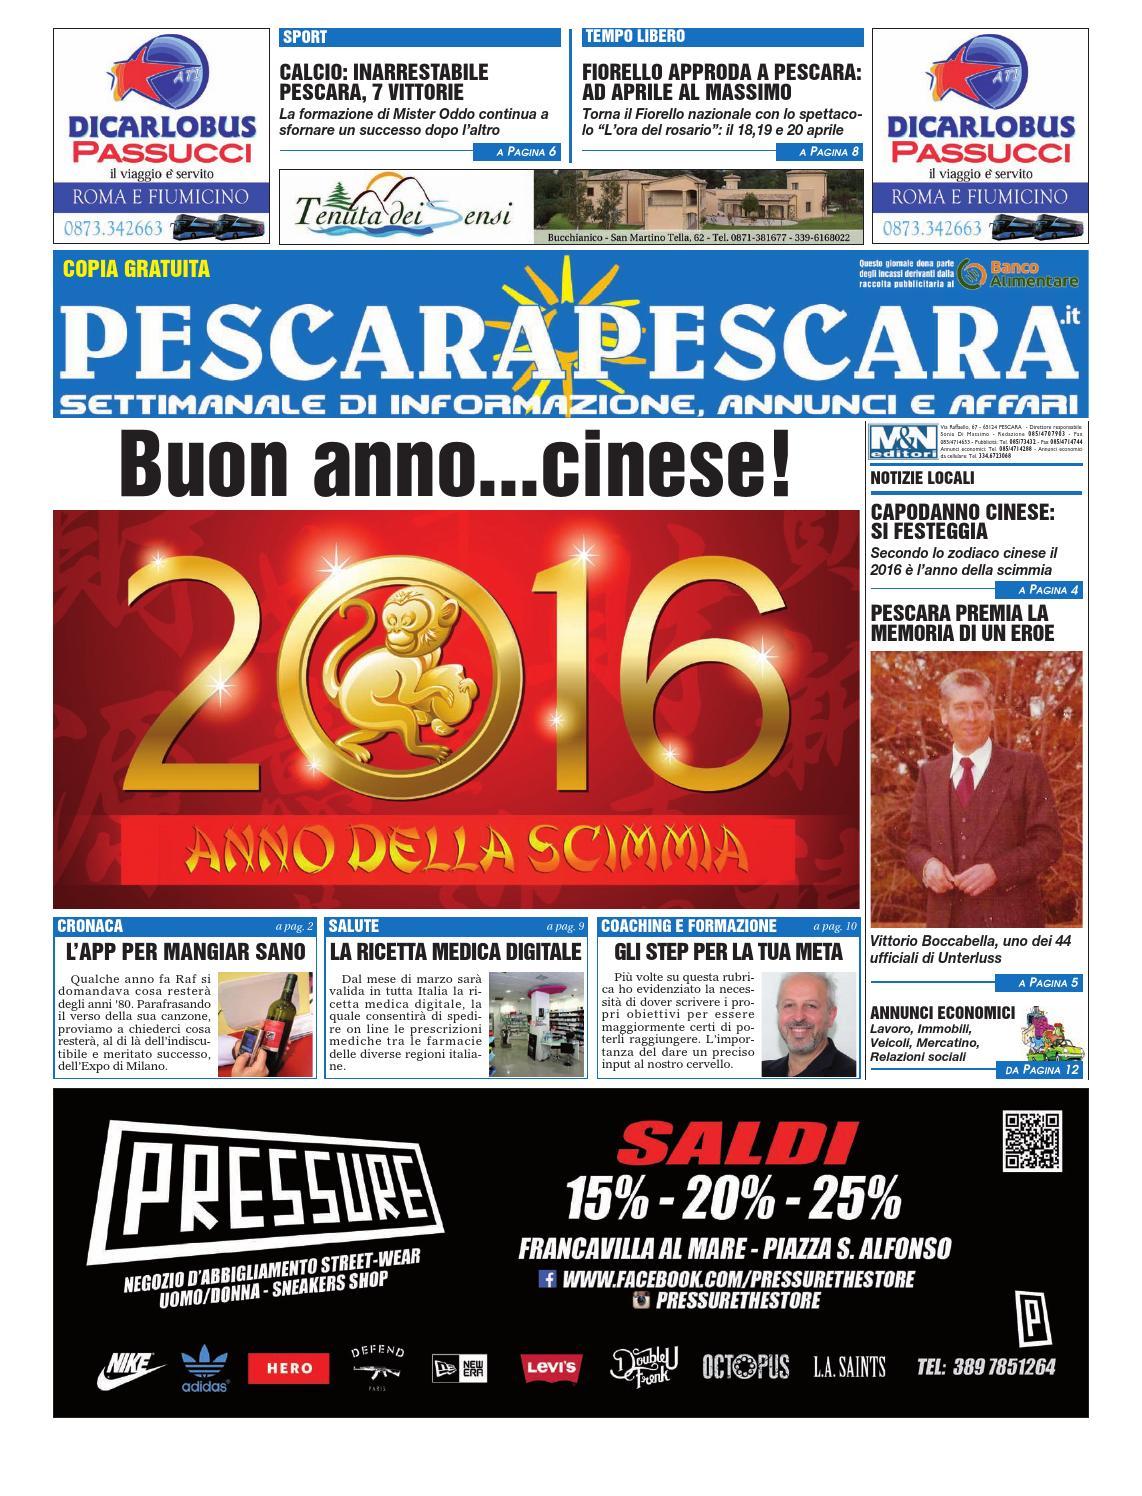 PescaraPescara 03 02 2016 by PescaraPescara - issuu 109451a87f5fb